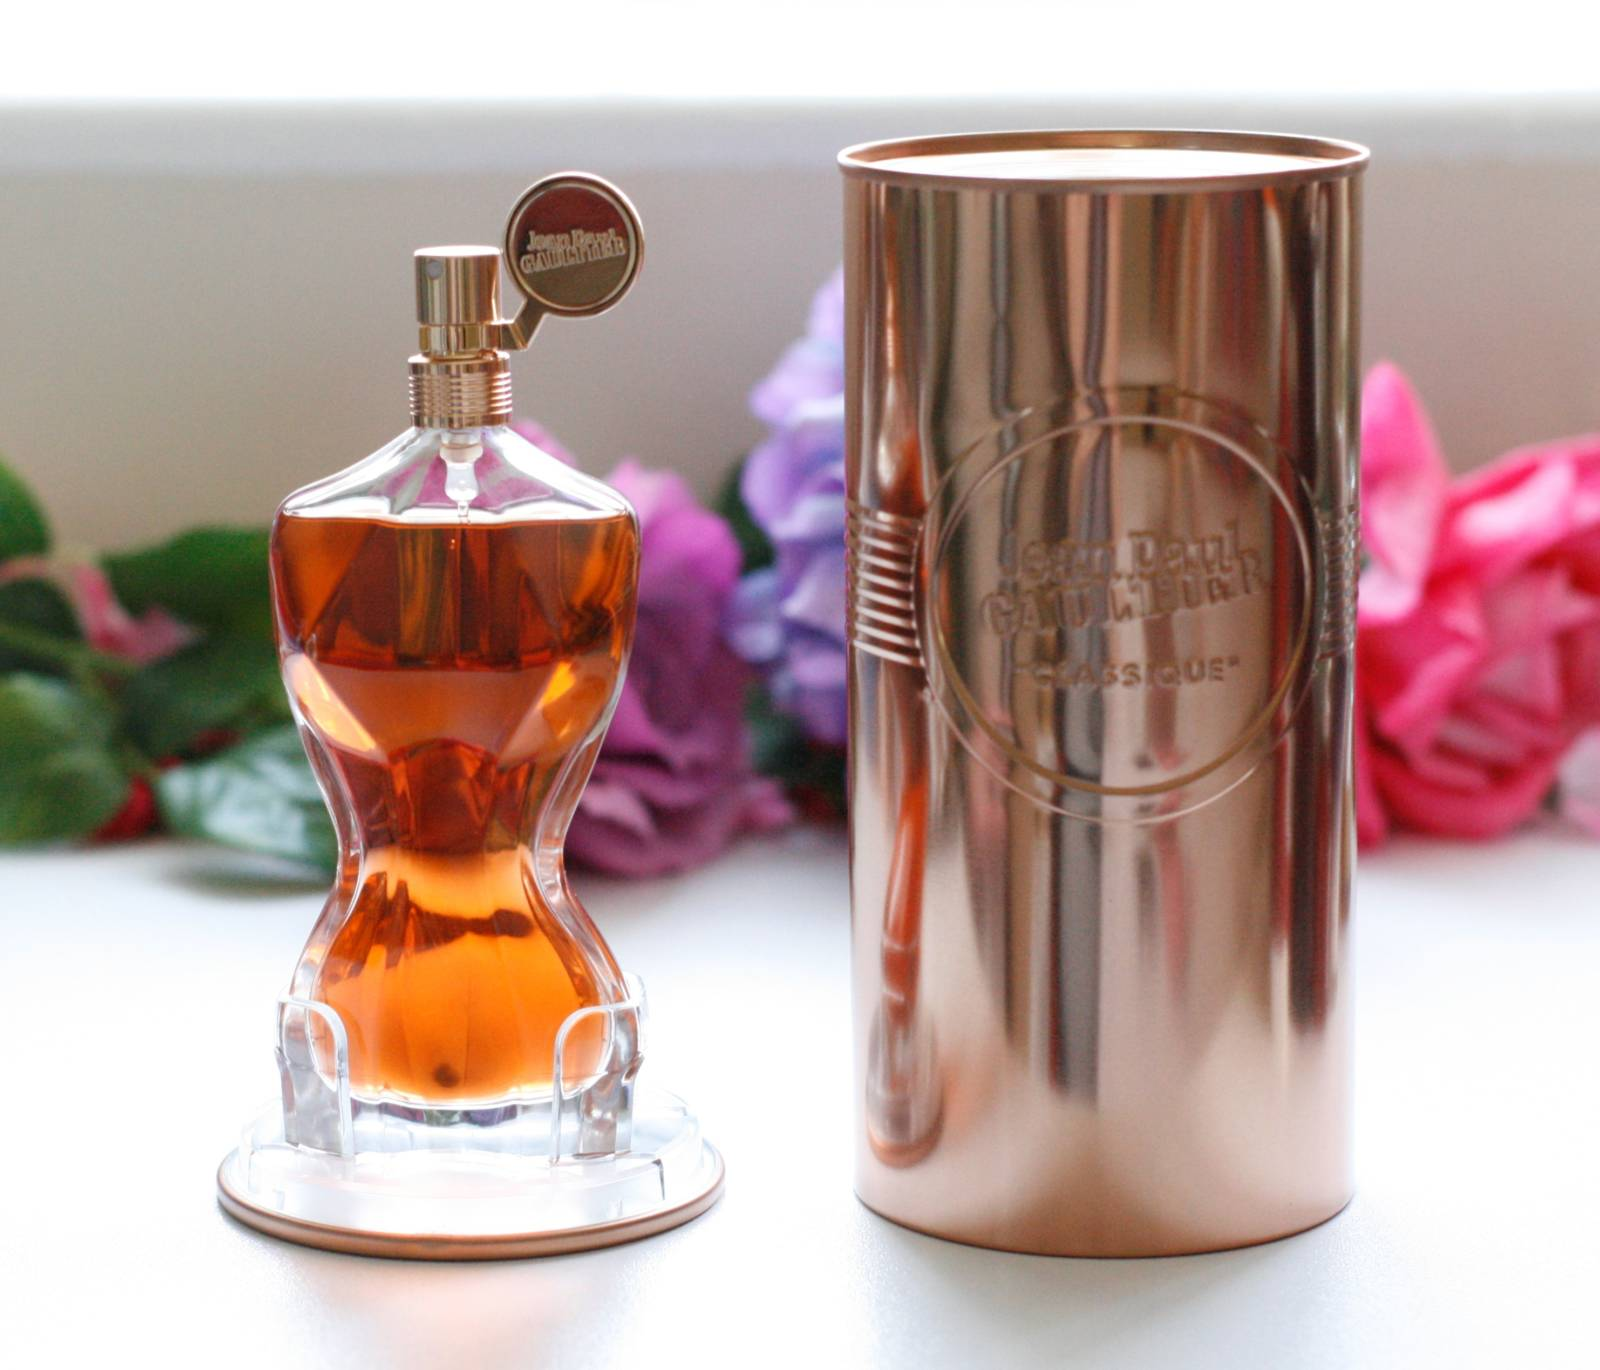 jean paul gaultier classique essence de parfum beauty. Black Bedroom Furniture Sets. Home Design Ideas